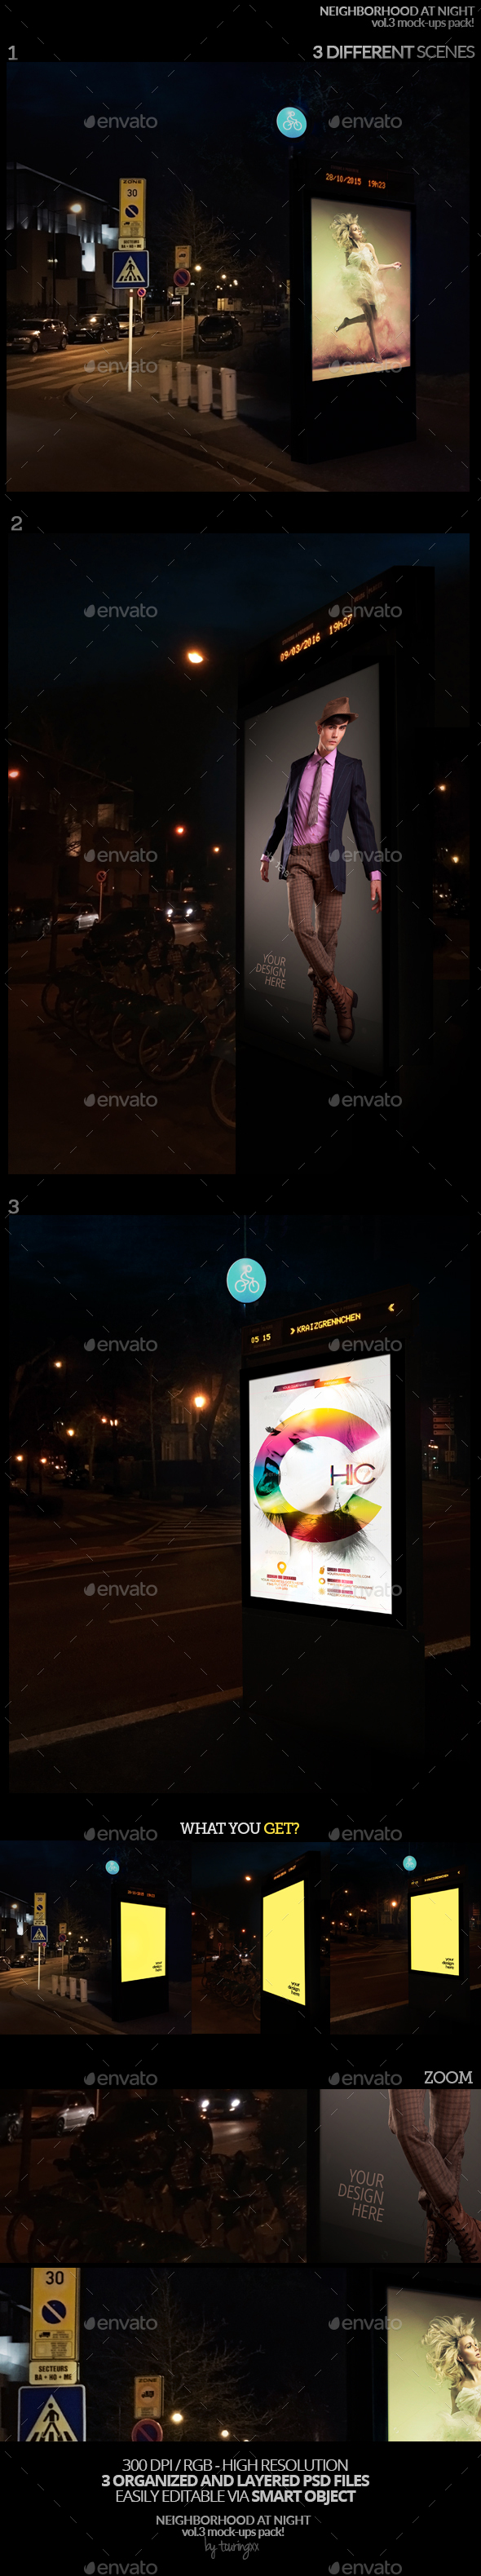 Neighborhood At Night Vol.3 Mock-Ups Pack - Product Mock-Ups Graphics